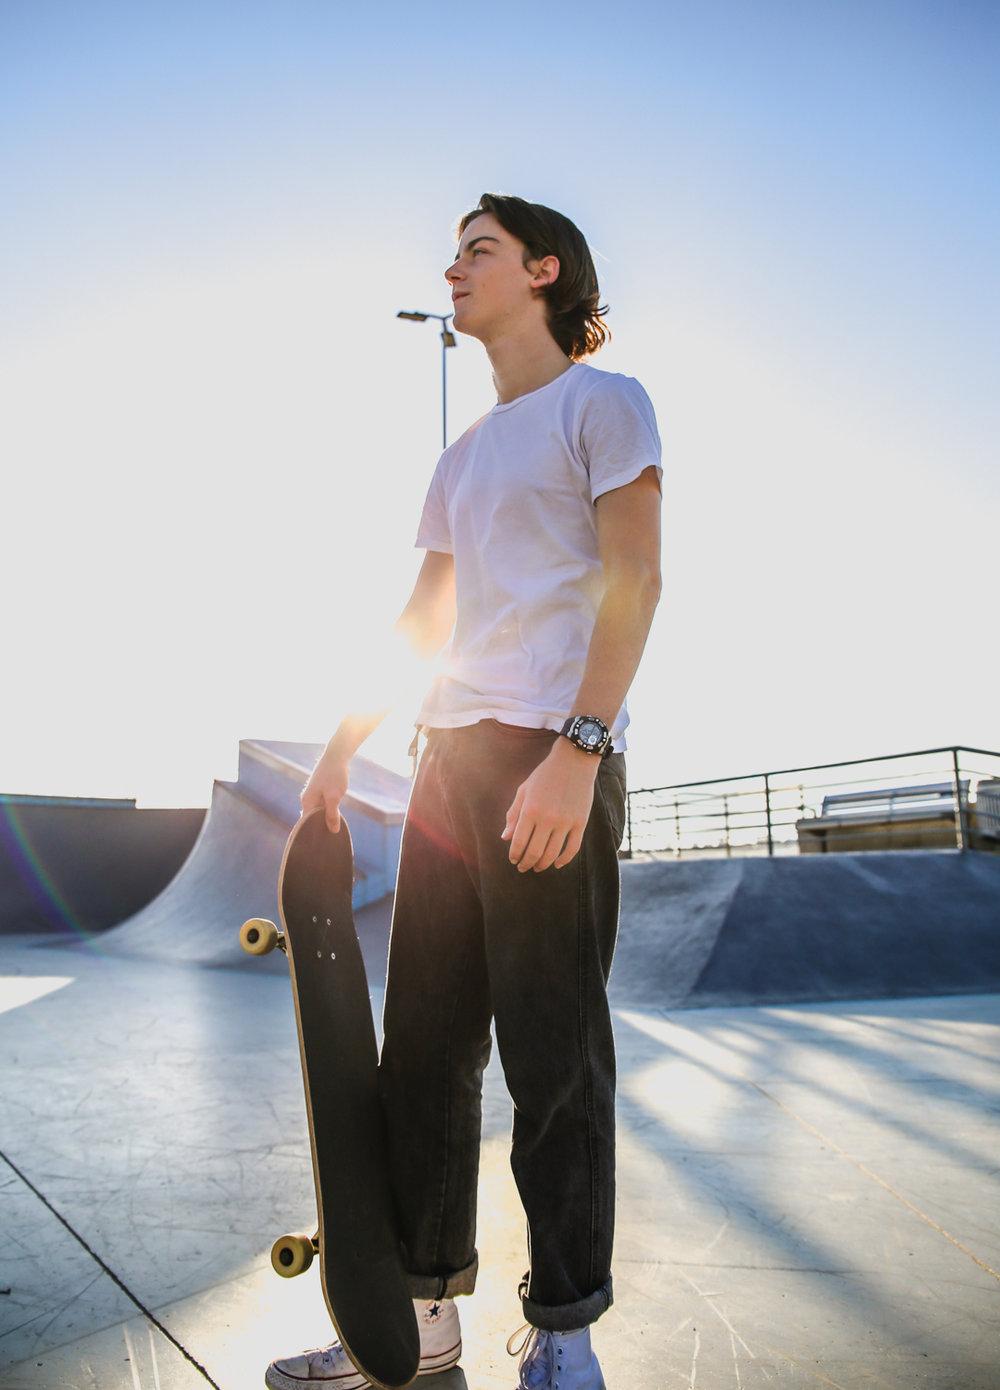 Maxum Skate 2018 (74 of 101).jpg